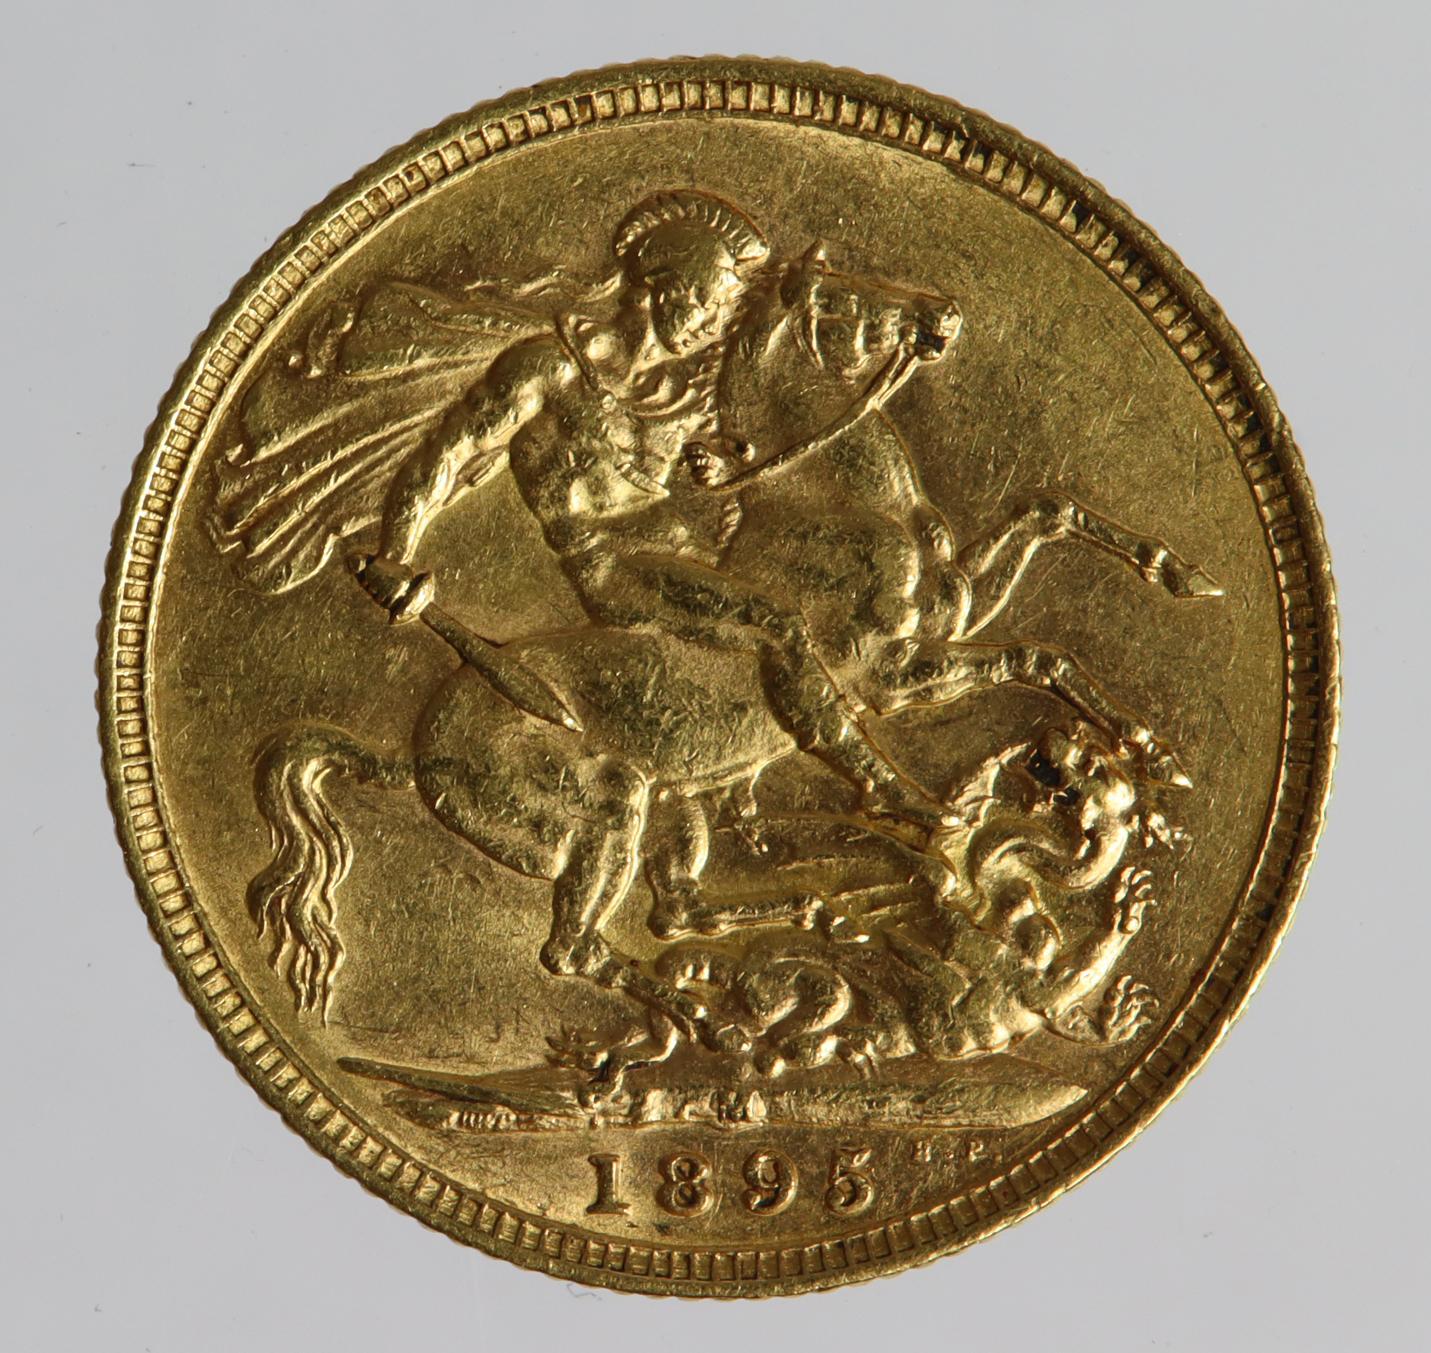 Sovereign 1895M, Melbourne Mint, Australia, GVF - Image 2 of 2